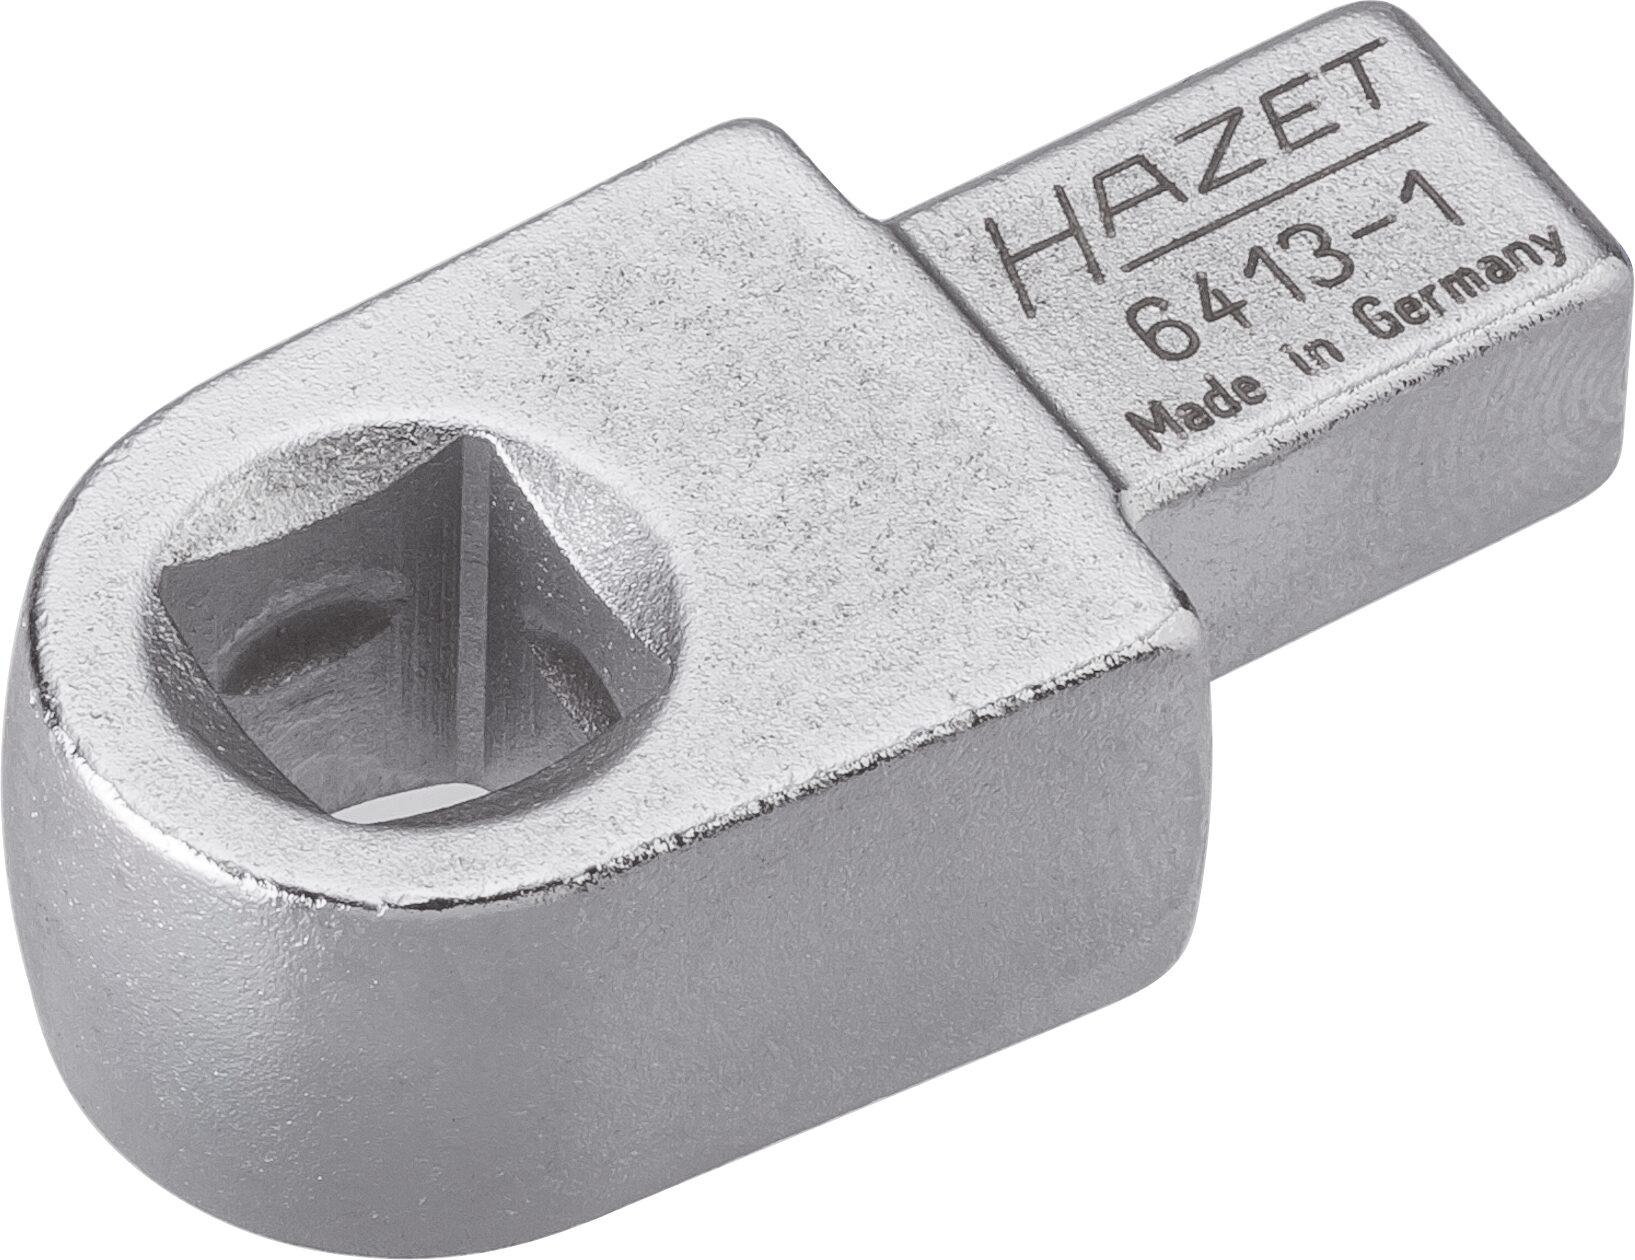 HAZET Einsteck-Vierkant Halter 6413-1 ∙ Einsteck-Vierkant 9 x 12 mm ∙ Vierkant hohl 10 mm (3/8 Zoll)